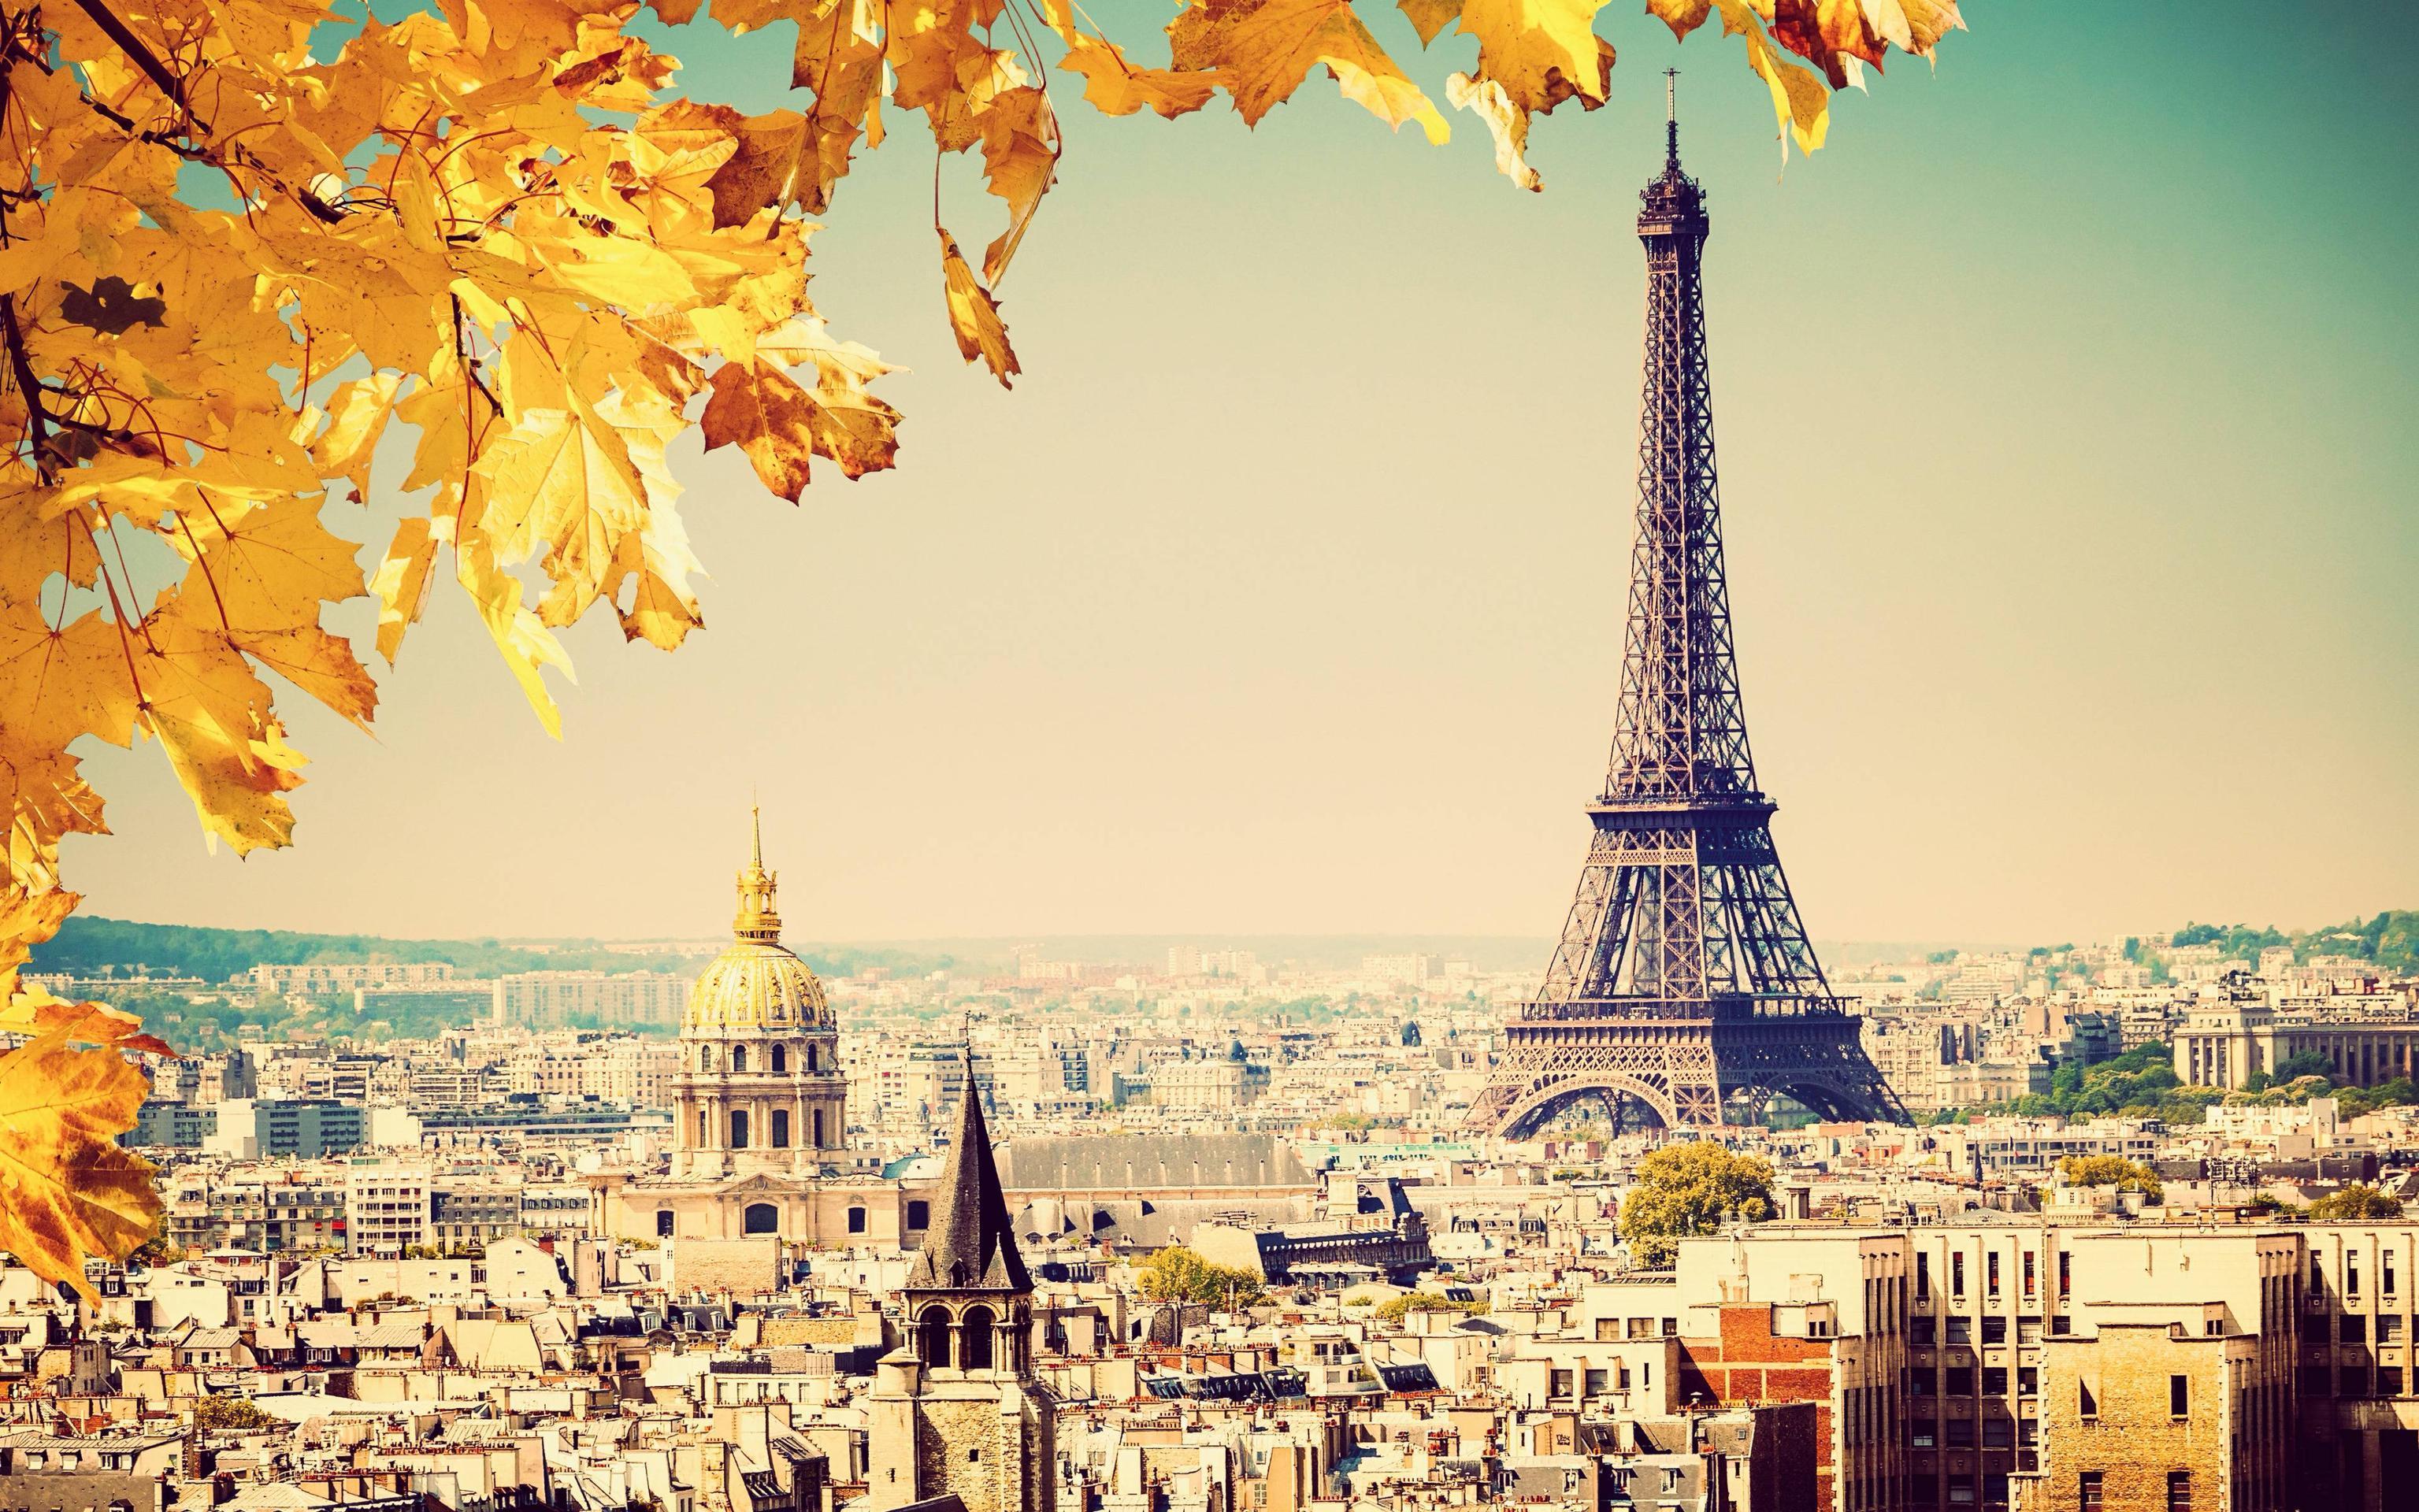 Vintage Paris Desktop Wallpapers Top Free Vintage Paris Desktop Backgrounds Wallpaperaccess